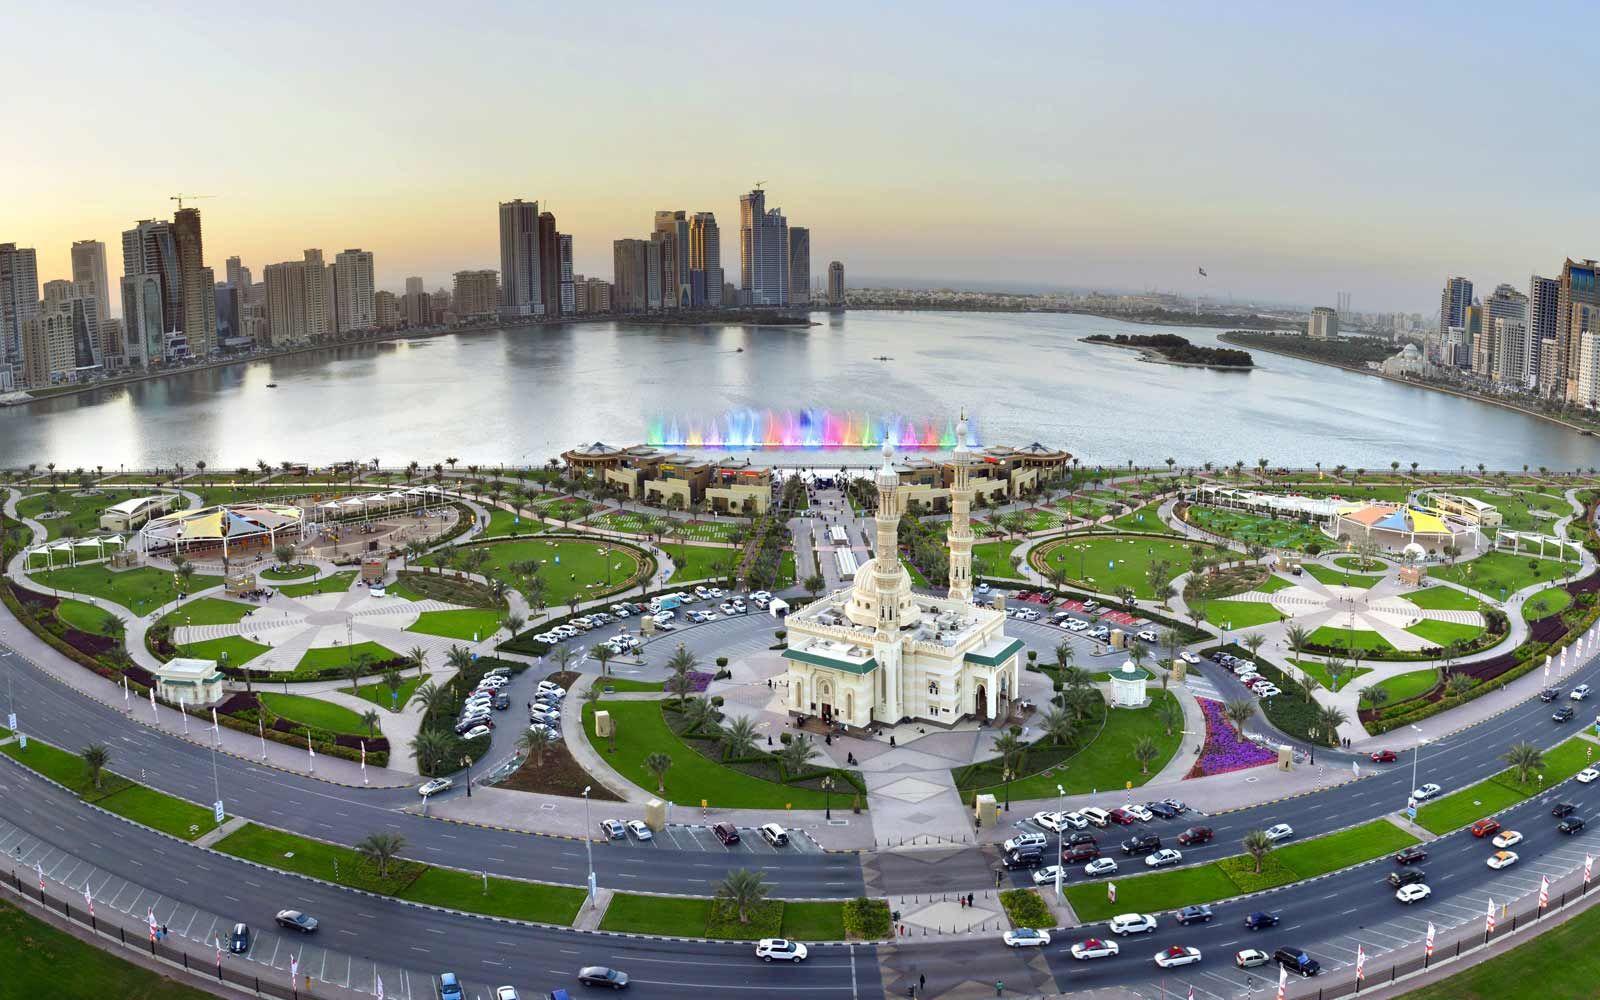 Al Majaz Waterfront, Sharjah. A family friendly leisure area